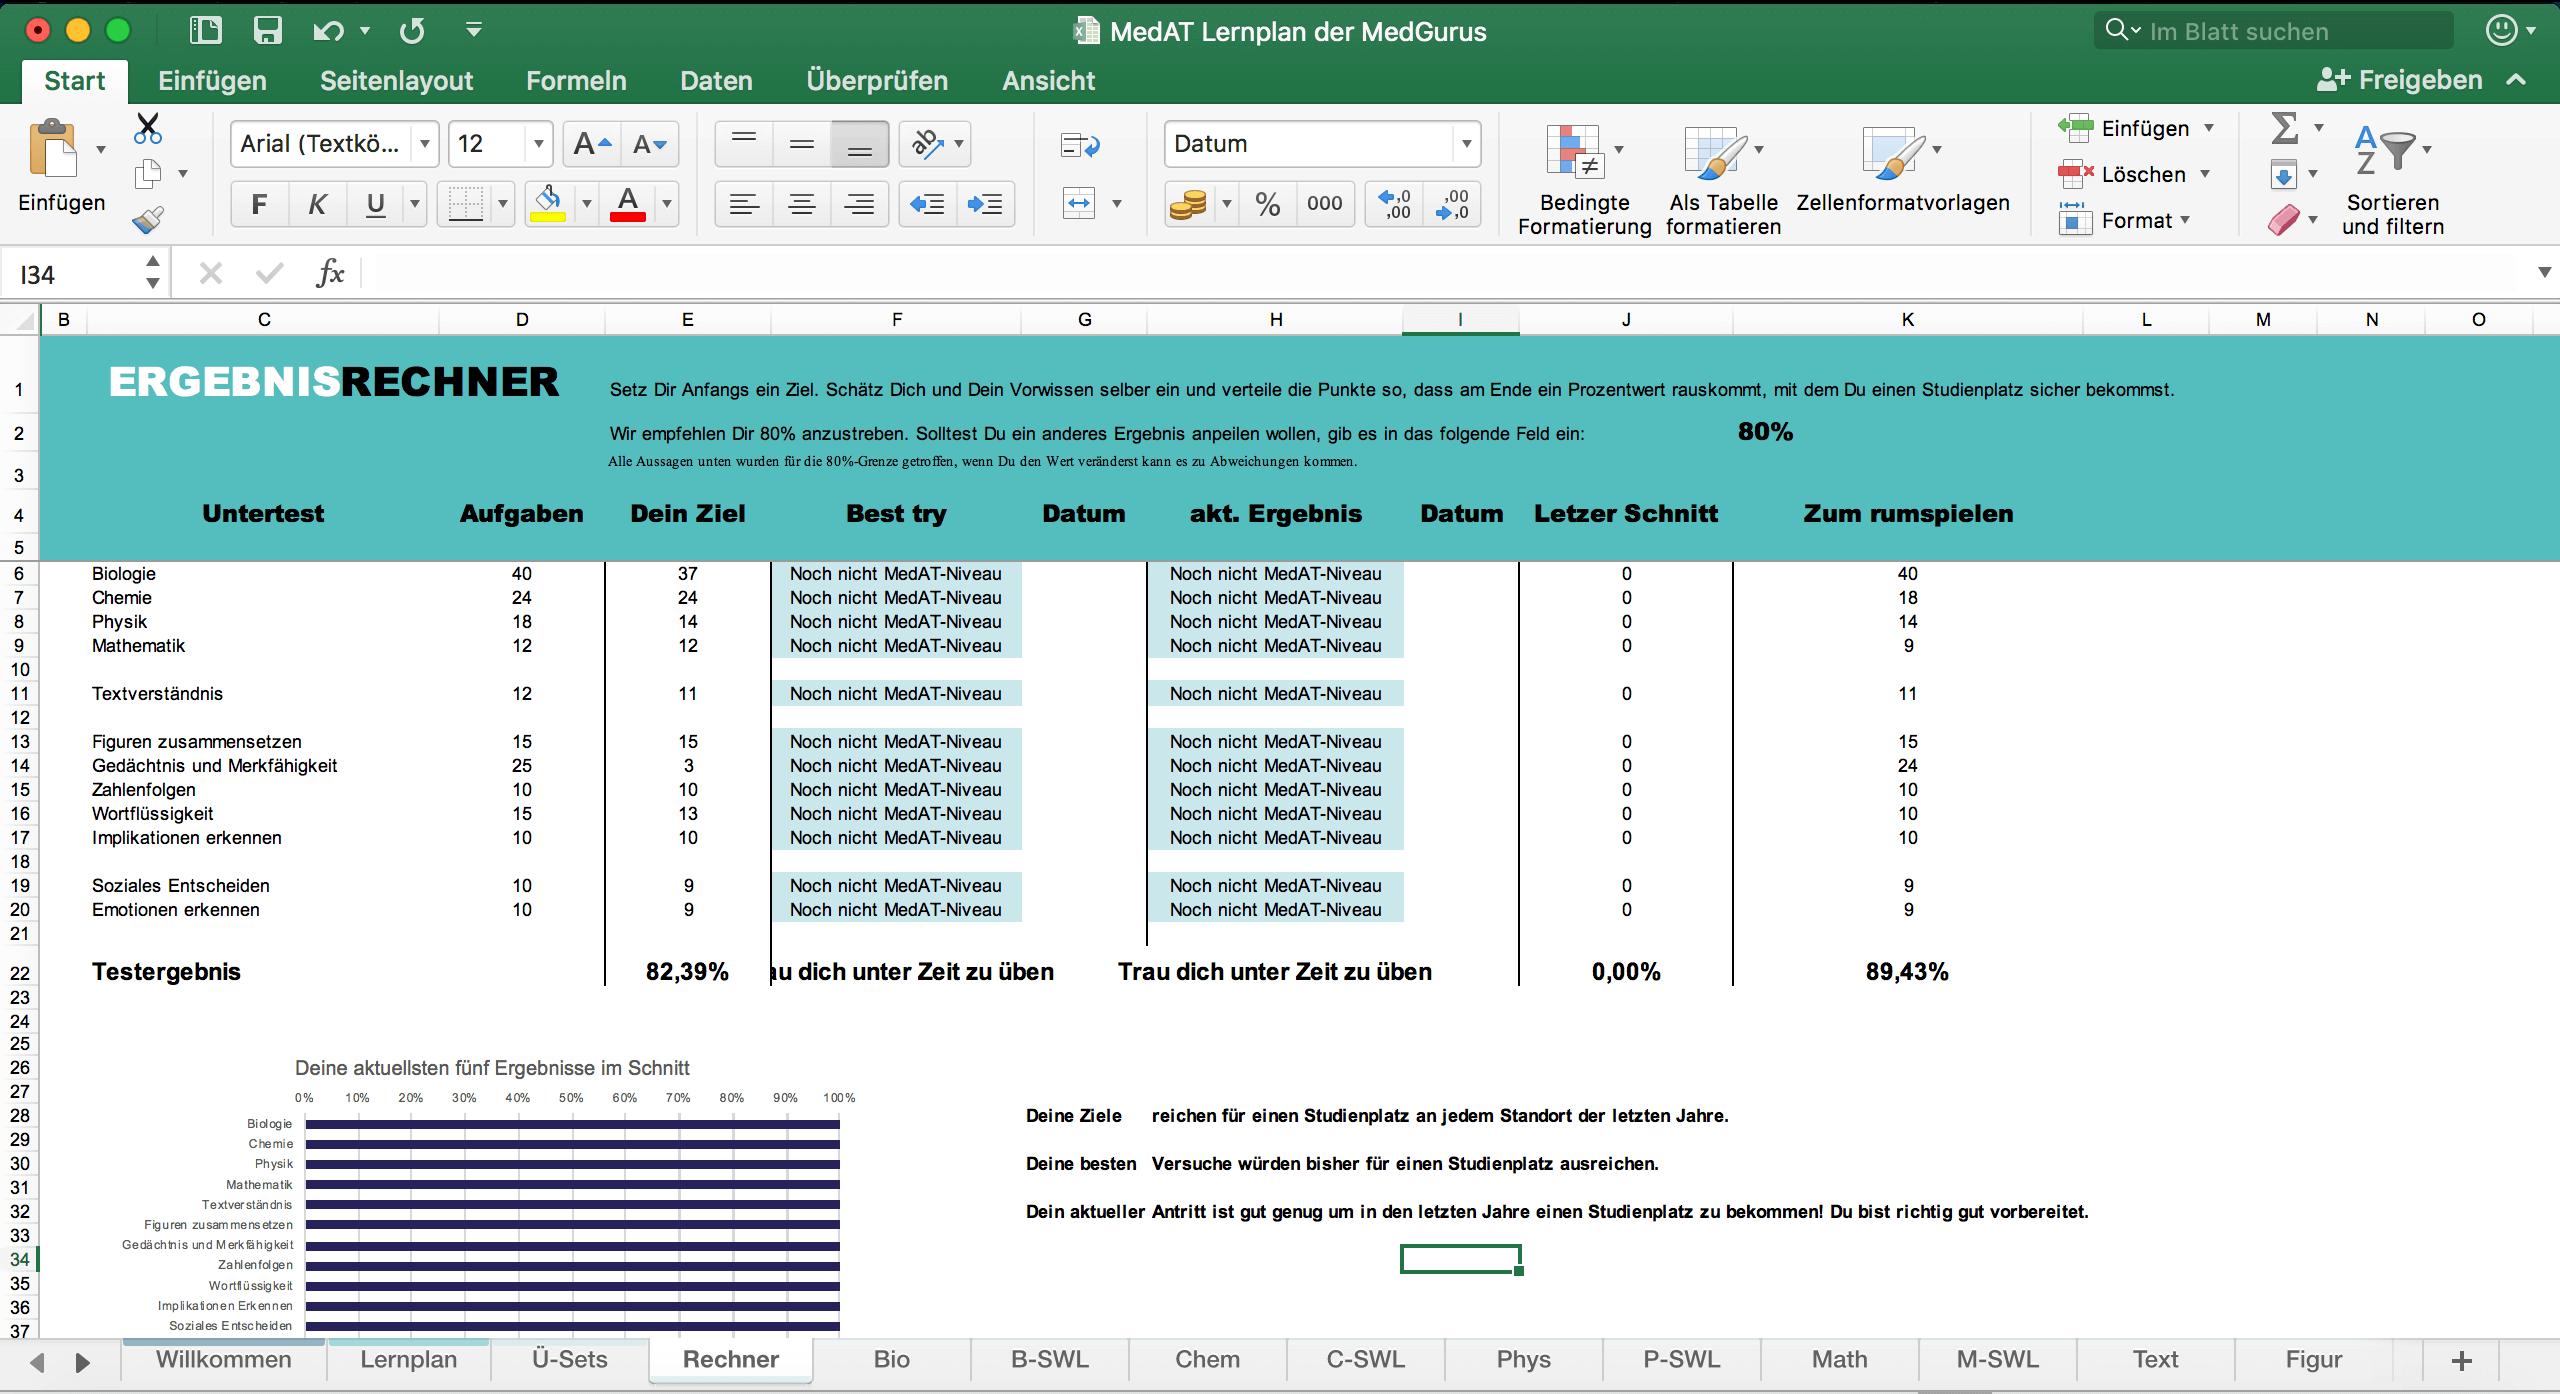 MedAT Lernplan - Ergebnisrechner MedGurus